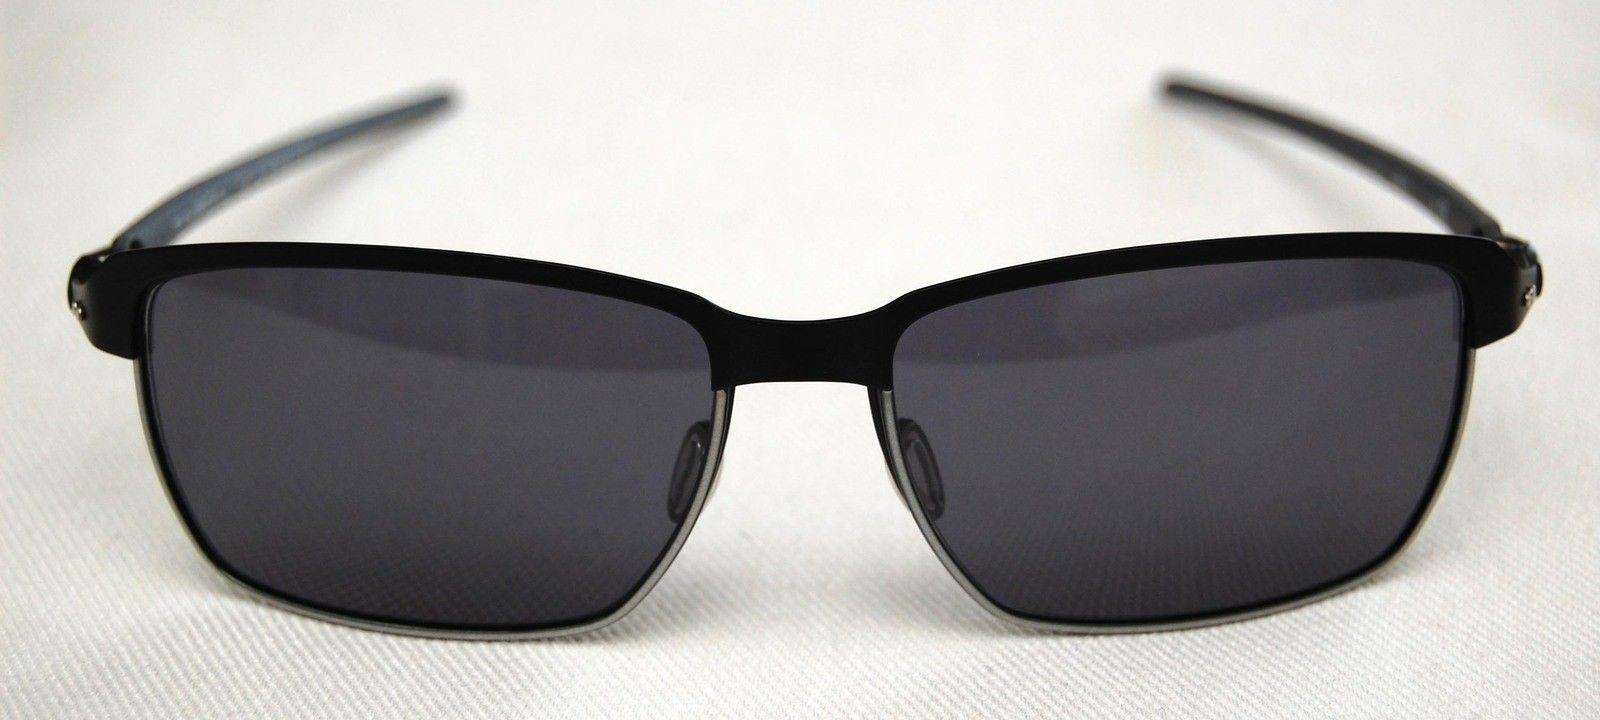 Tinfoil Carbon OO6018-01 Matte Black / Silver | Grey Lens - 01.jpg